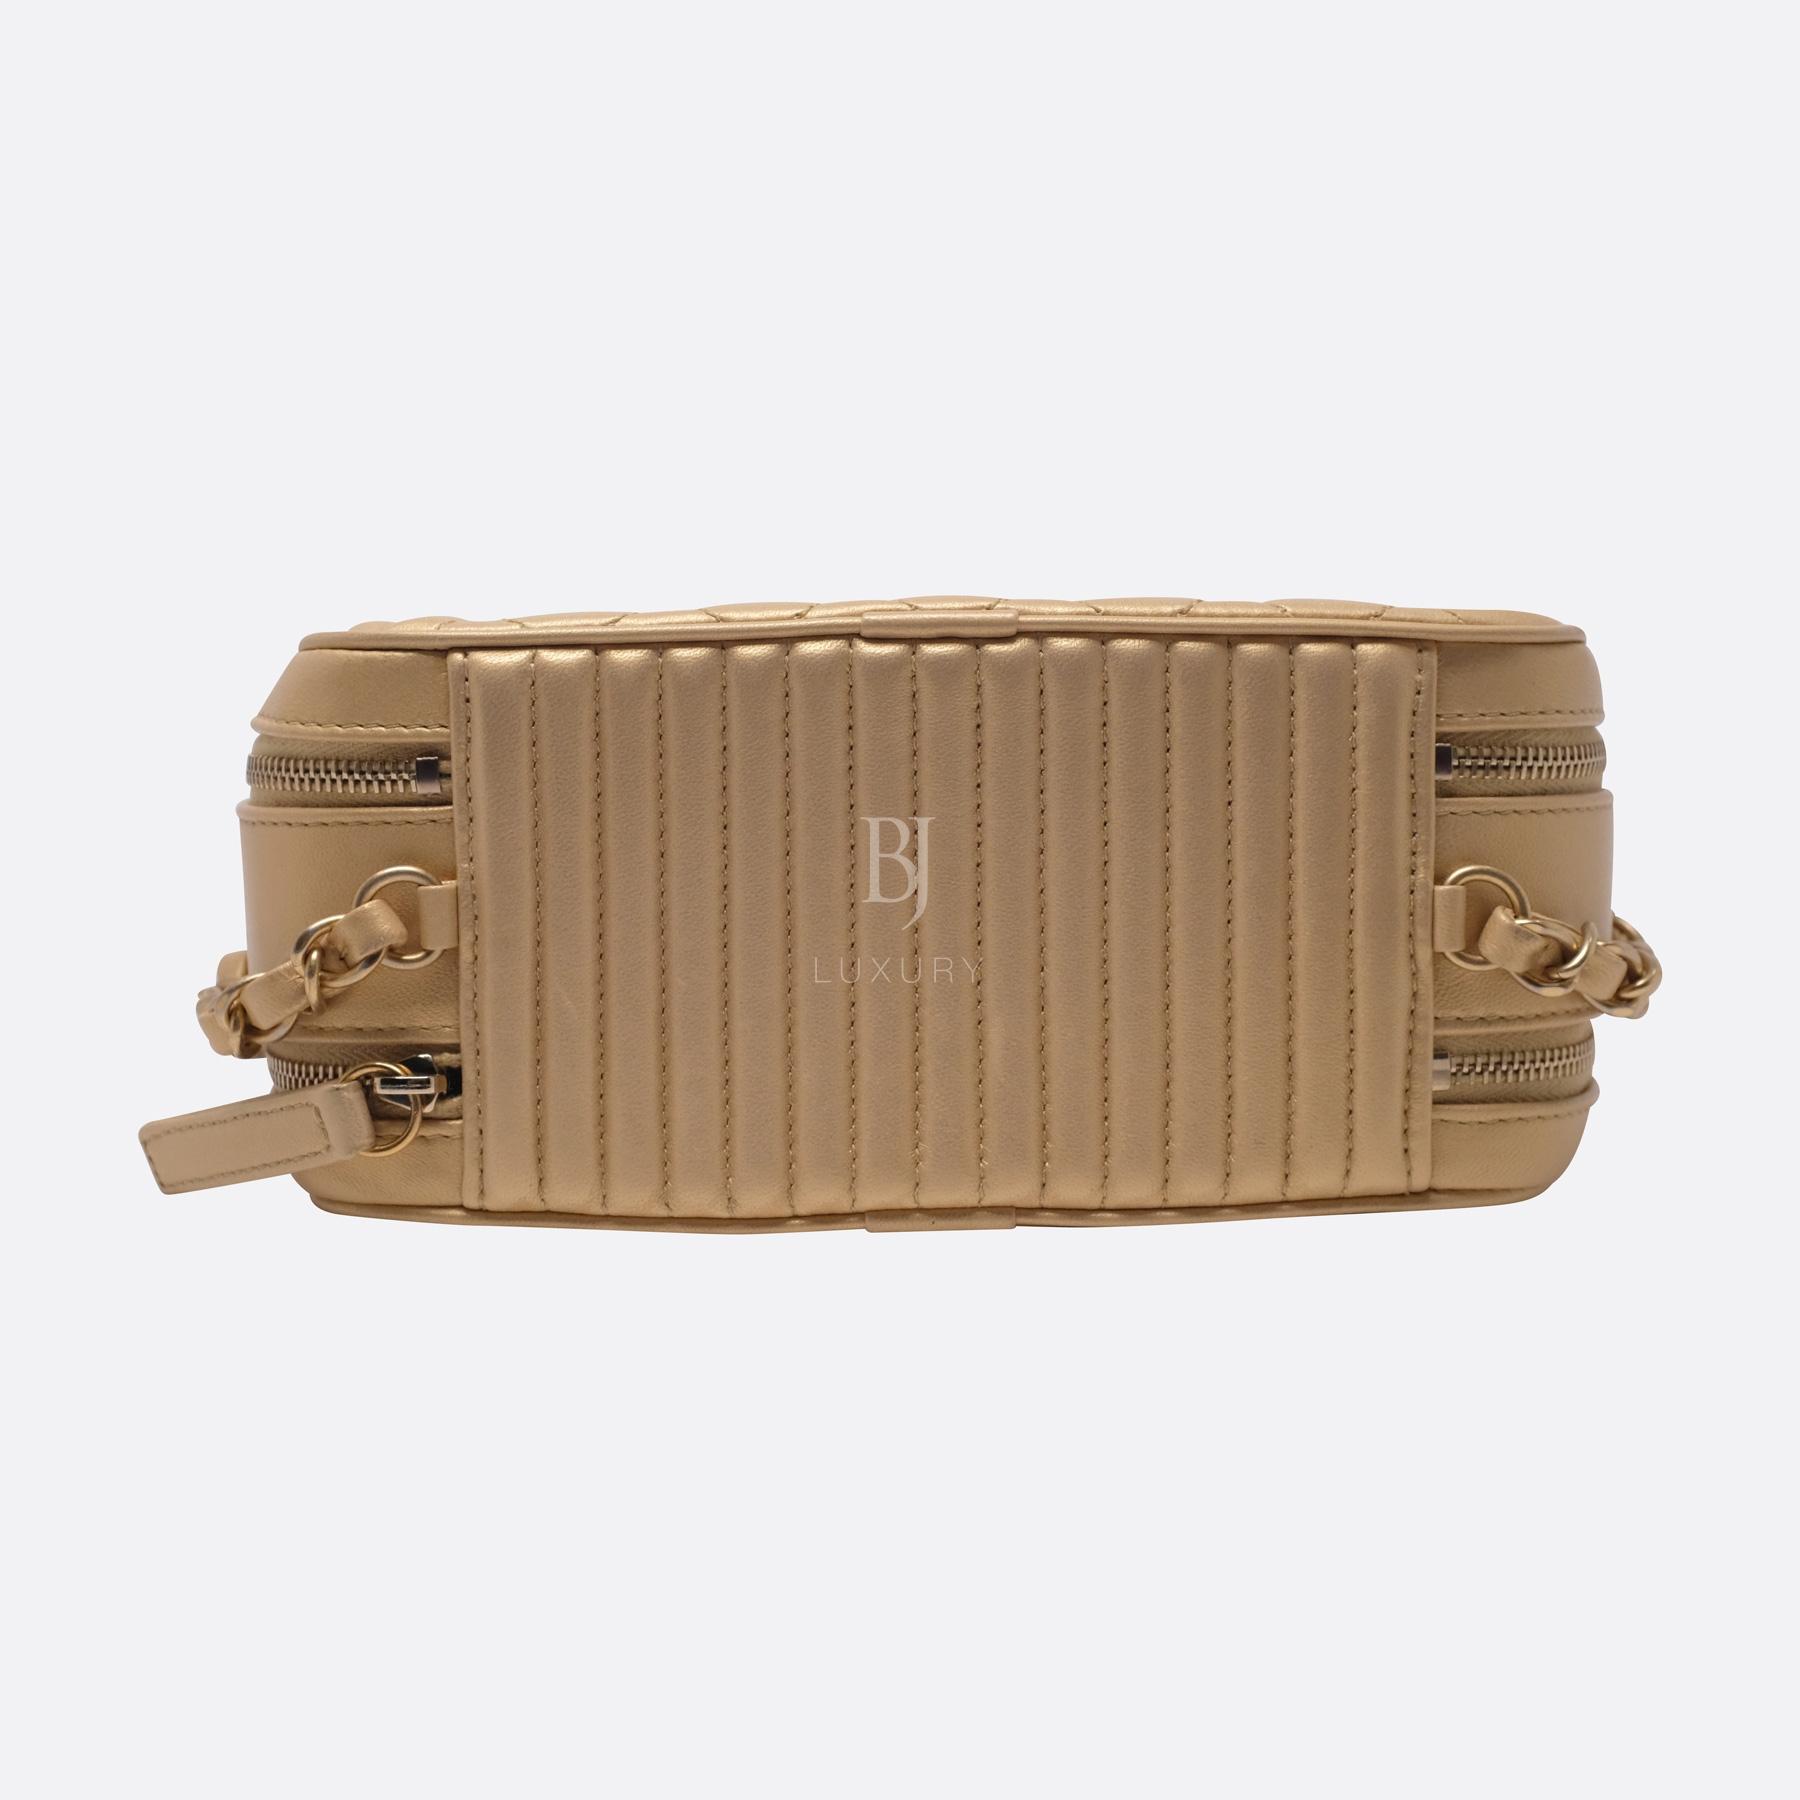 Chanel Camera Case Medium Brushed Gold Calf Gold BJ Luxury 13.jpg